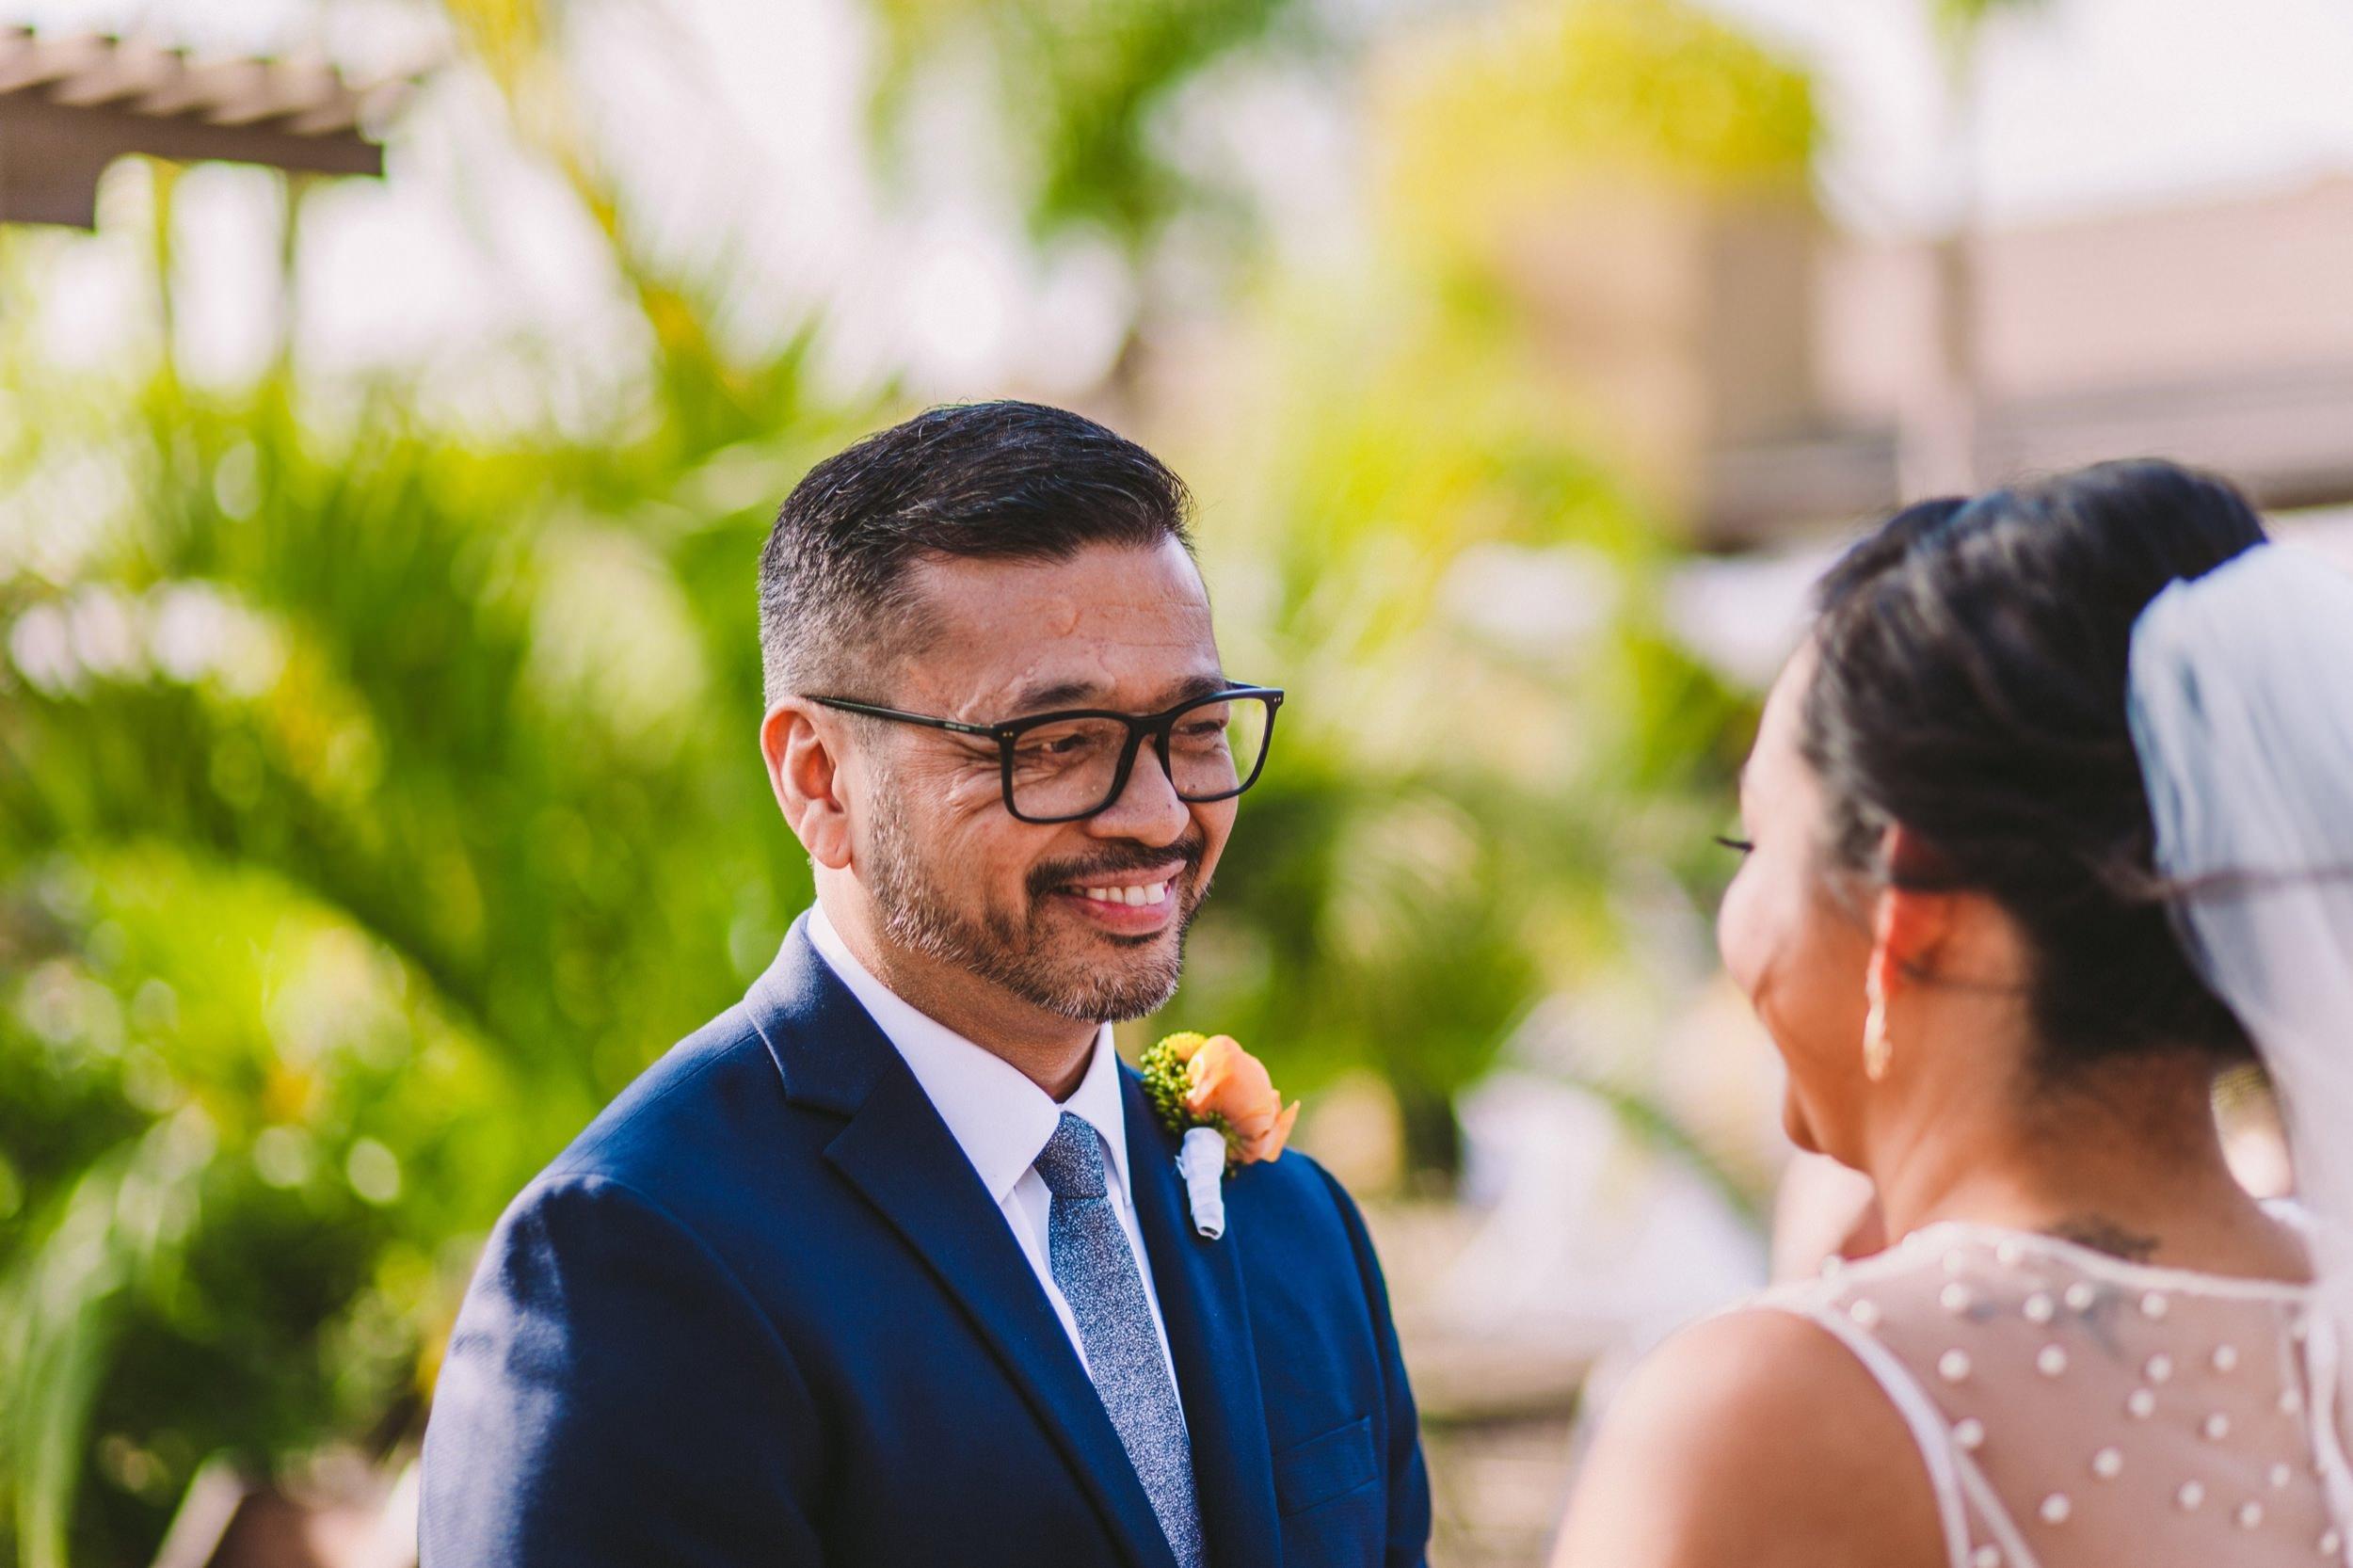 Happy Groom During Wedding Ceremony - Documentary Wedding Photography in Temecula